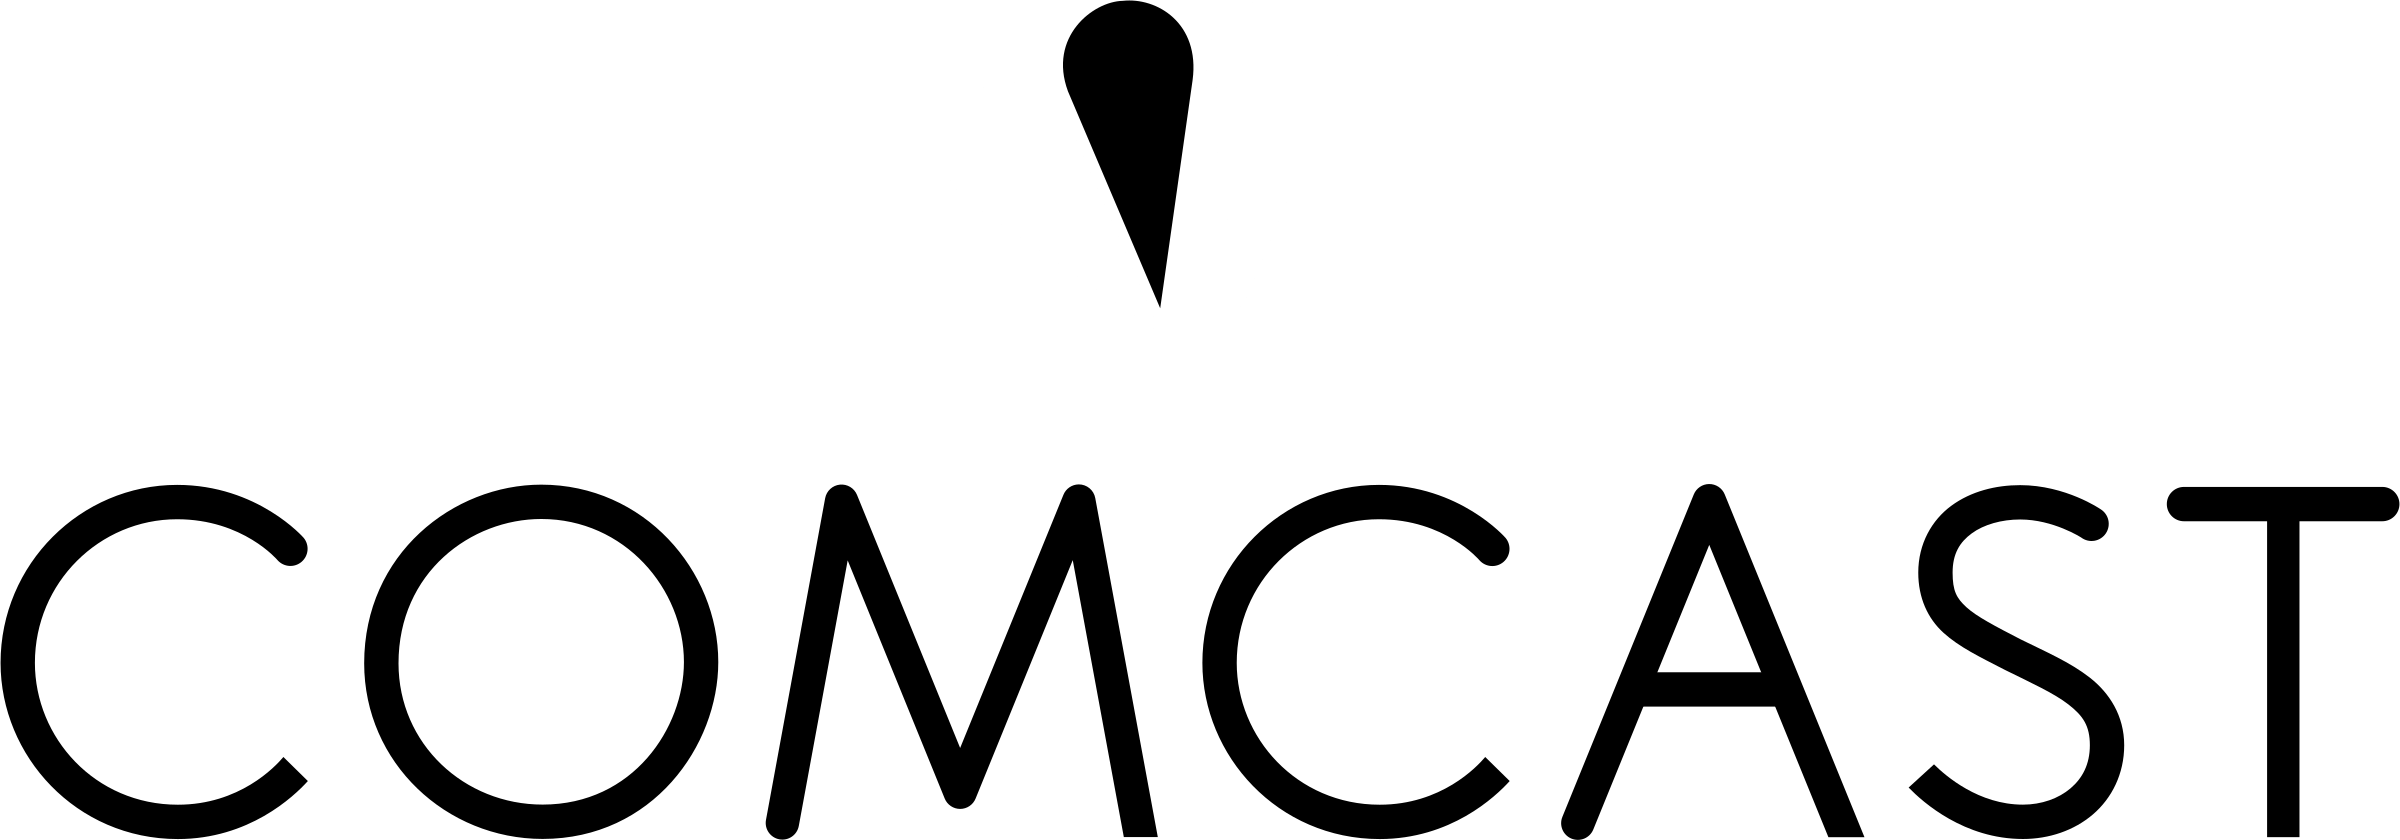 Comcast Logo Png Transparent Svg Vector Freebie Supply